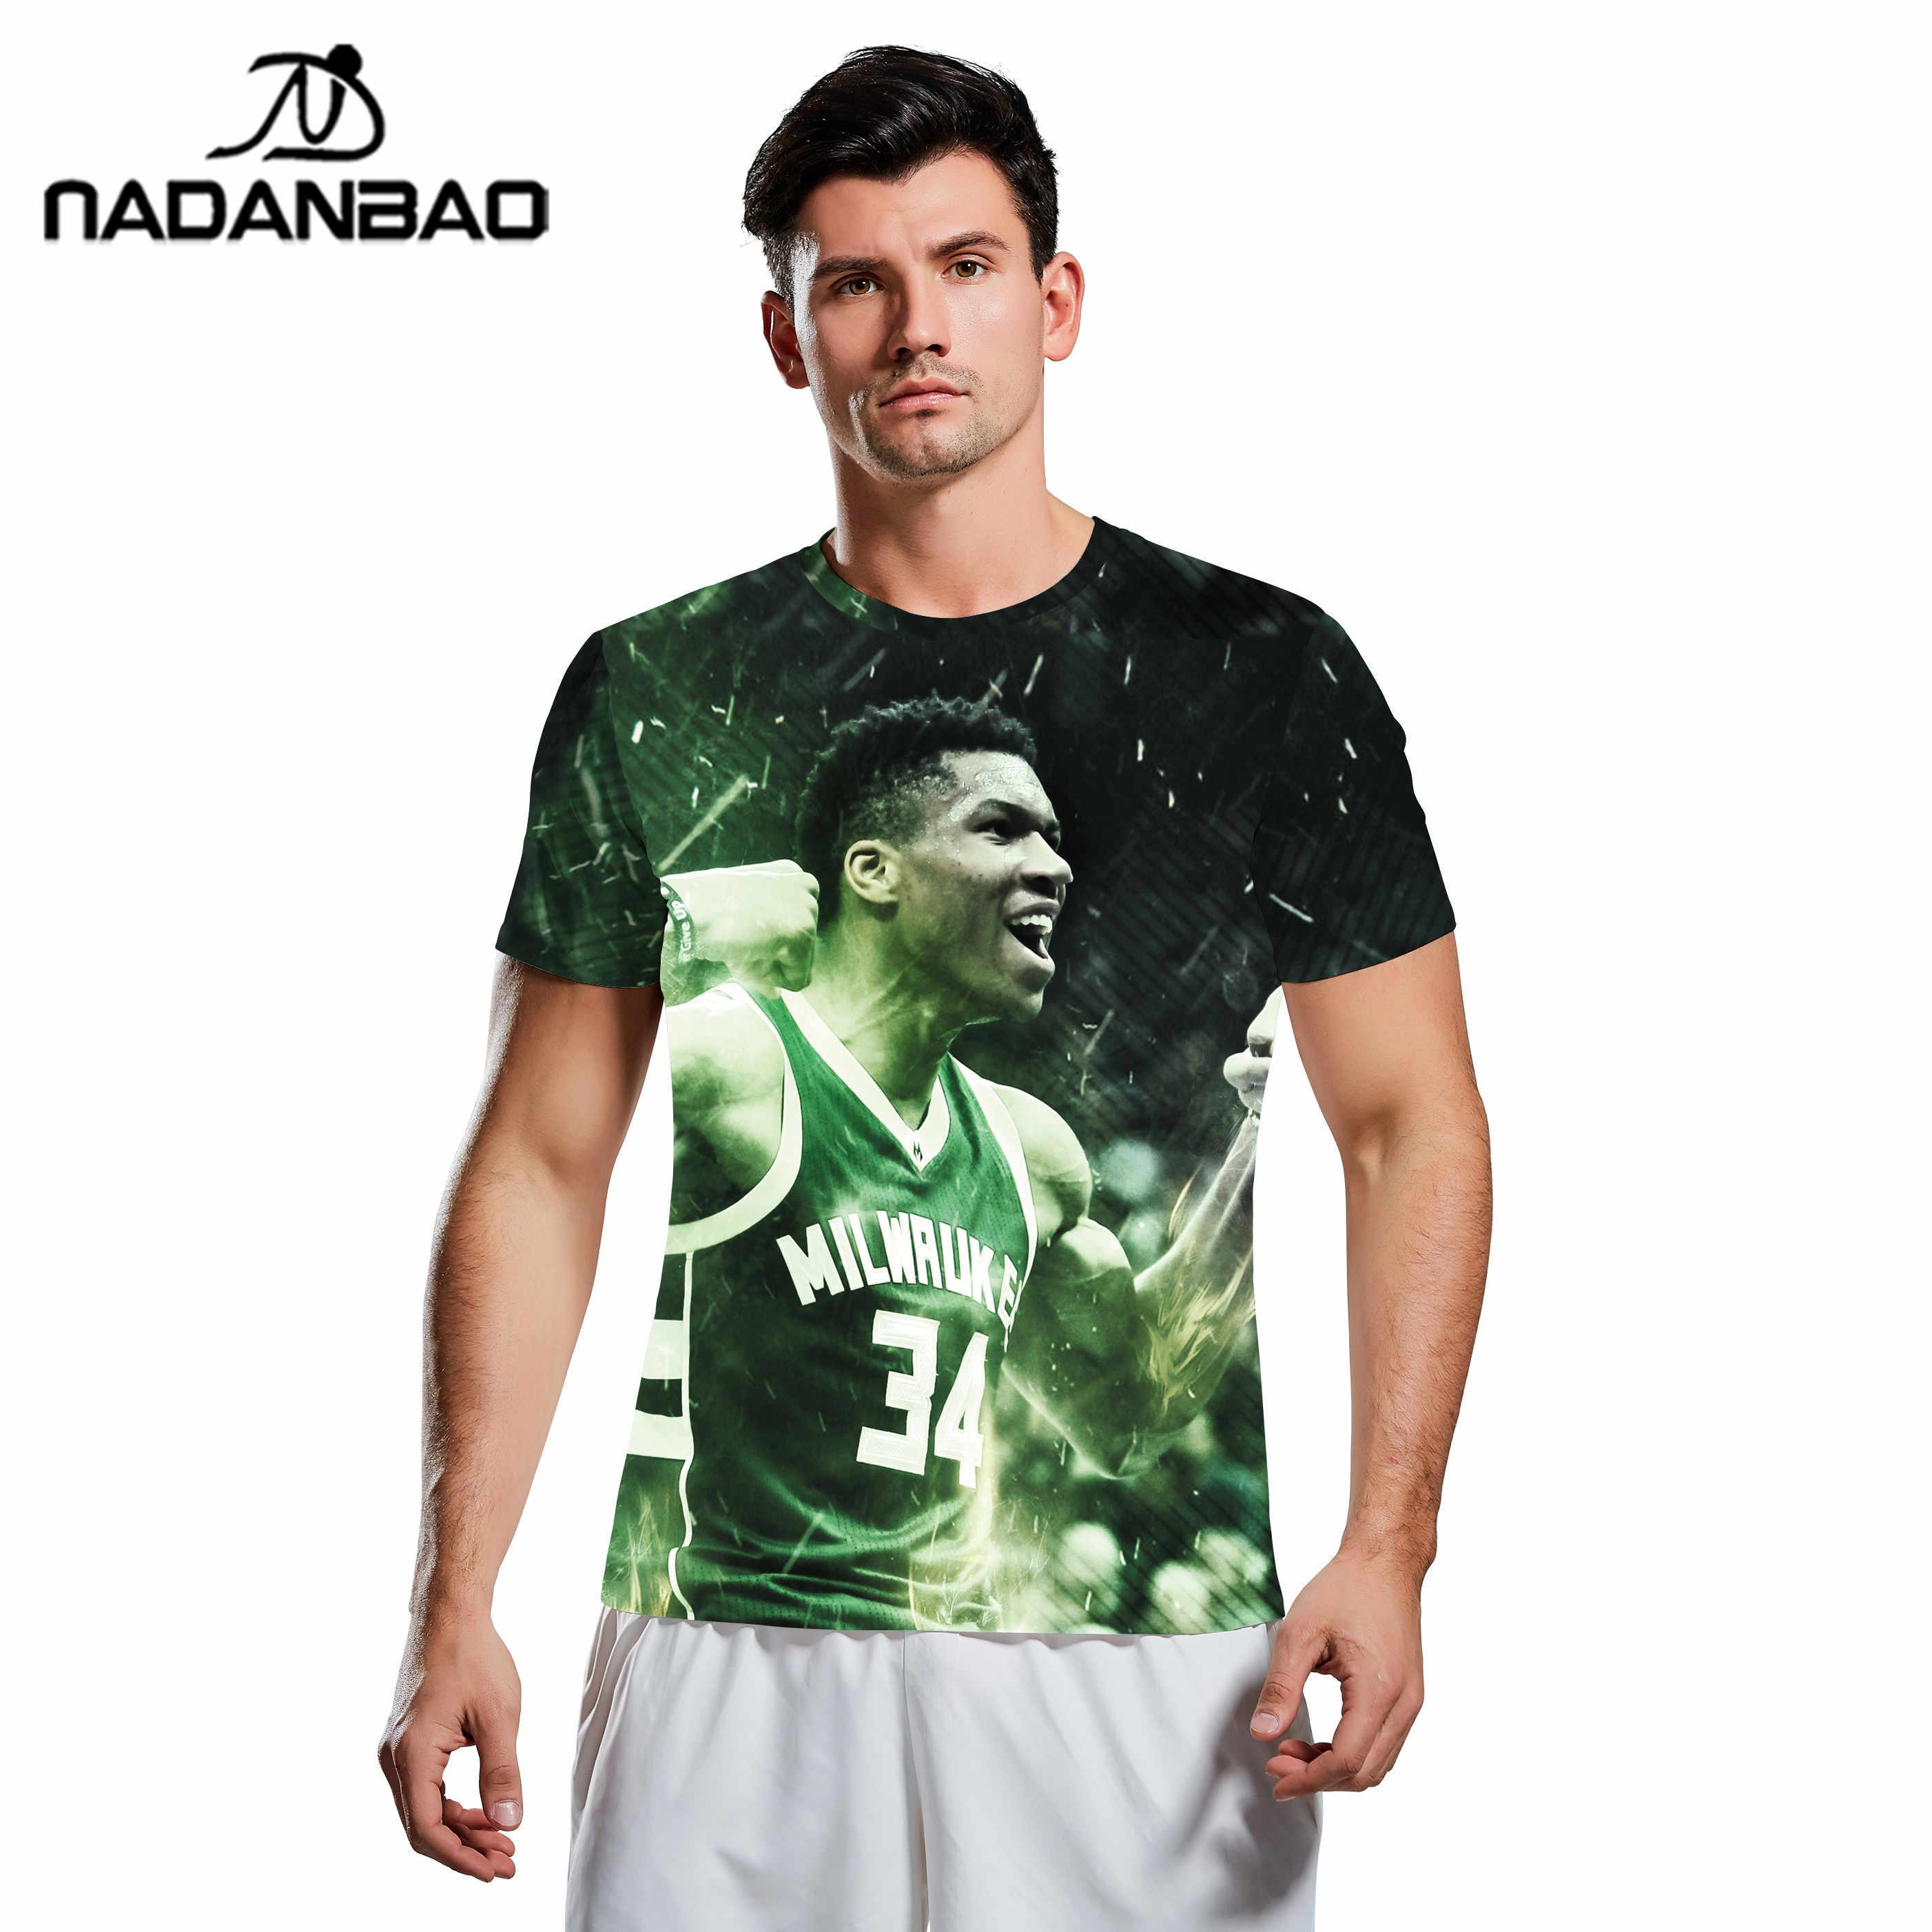 finest selection e1fbd e27bf NADANBAO Men Giannis Antetokounmpo 3D Digital Printed Tee Casual Tops MVP  Bucks Short Sleeve Basketball T Shirt Jerseys